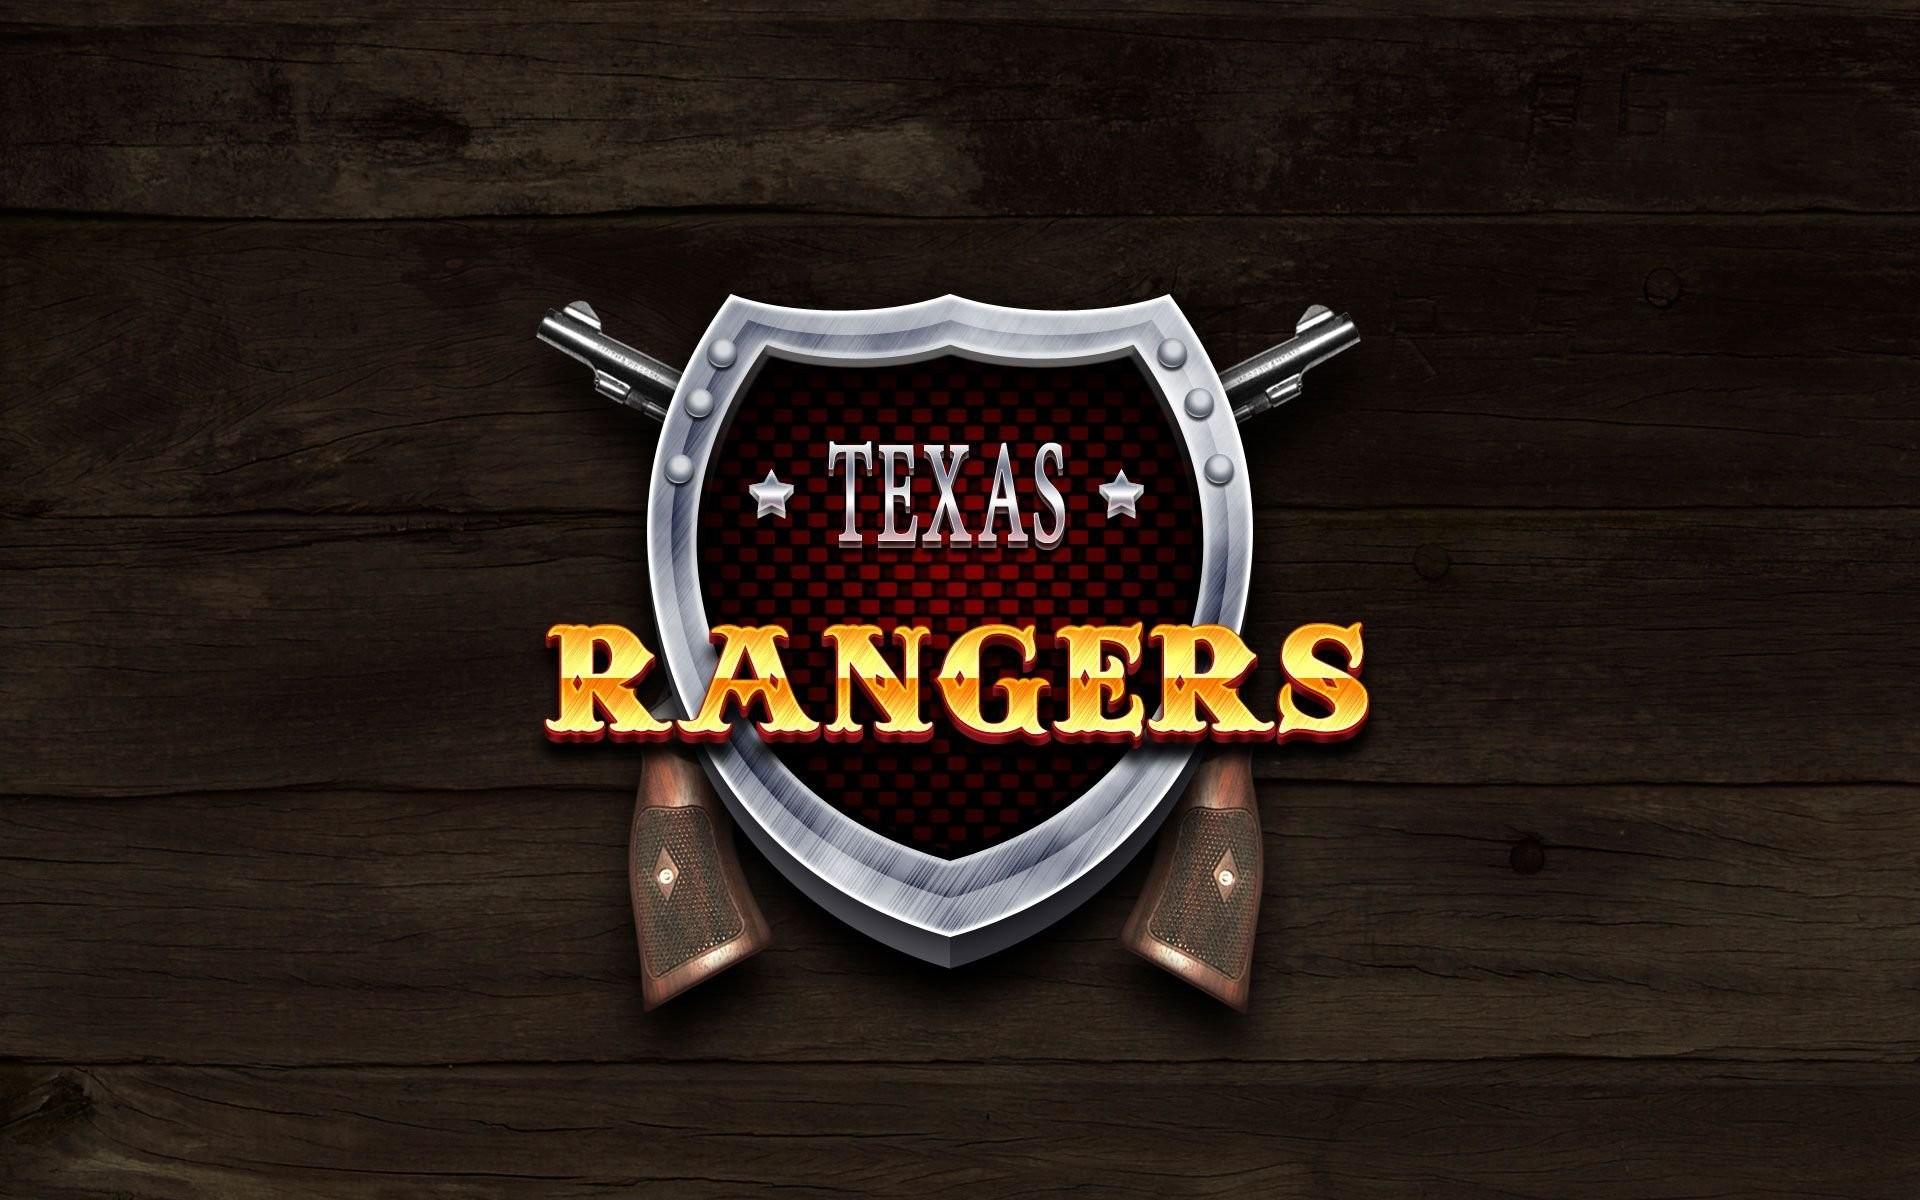 … texas rangers wallpaper; texas rangers 768076 walldevil …